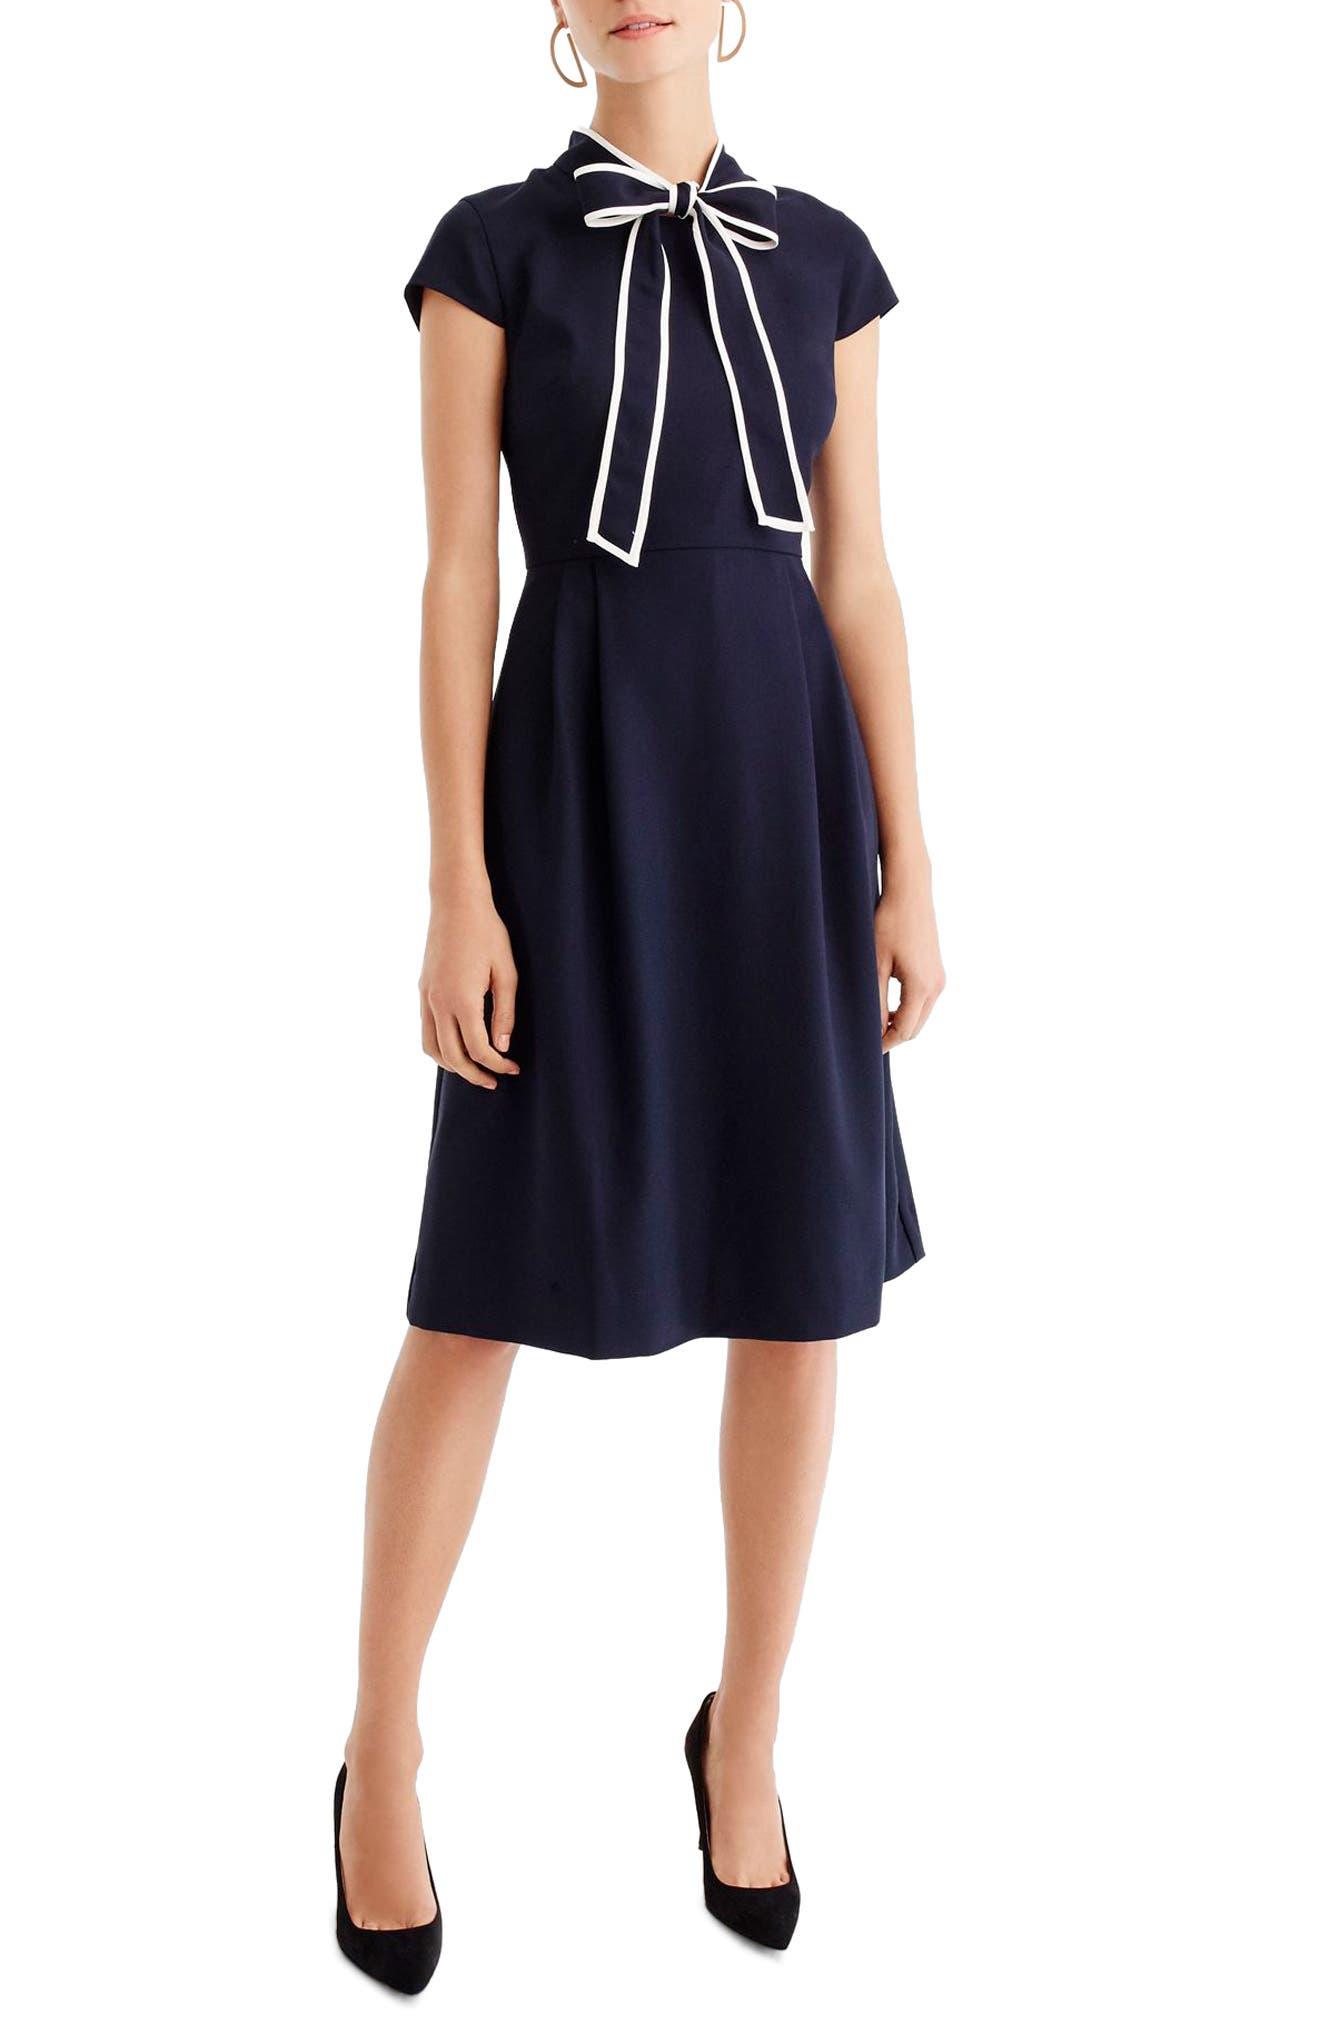 1930s Dresses | 30s Art Deco Dress Womens J.crew Tie-Neck Dress $94.80 AT vintagedancer.com